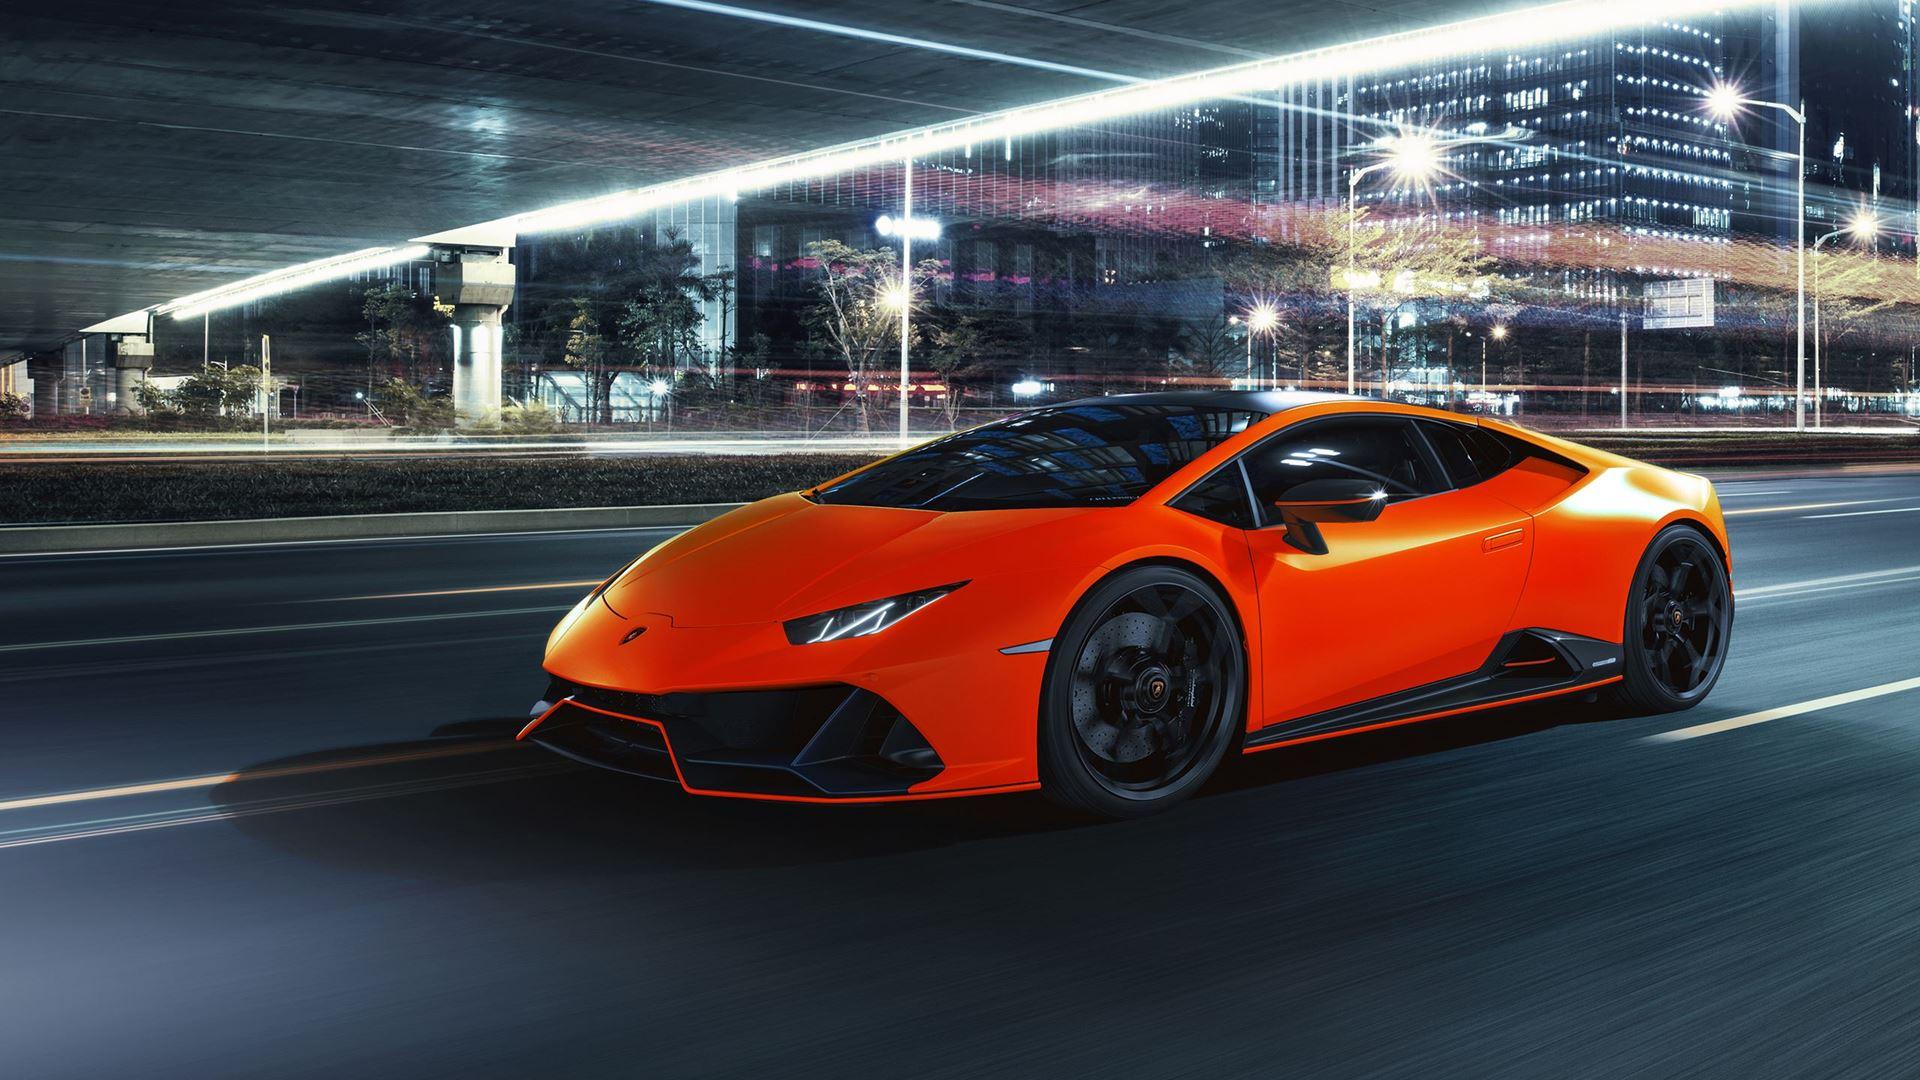 Daring elegance: Automobili Lamborghini presents the Huracán EVO Fluo Capsule - Image 1